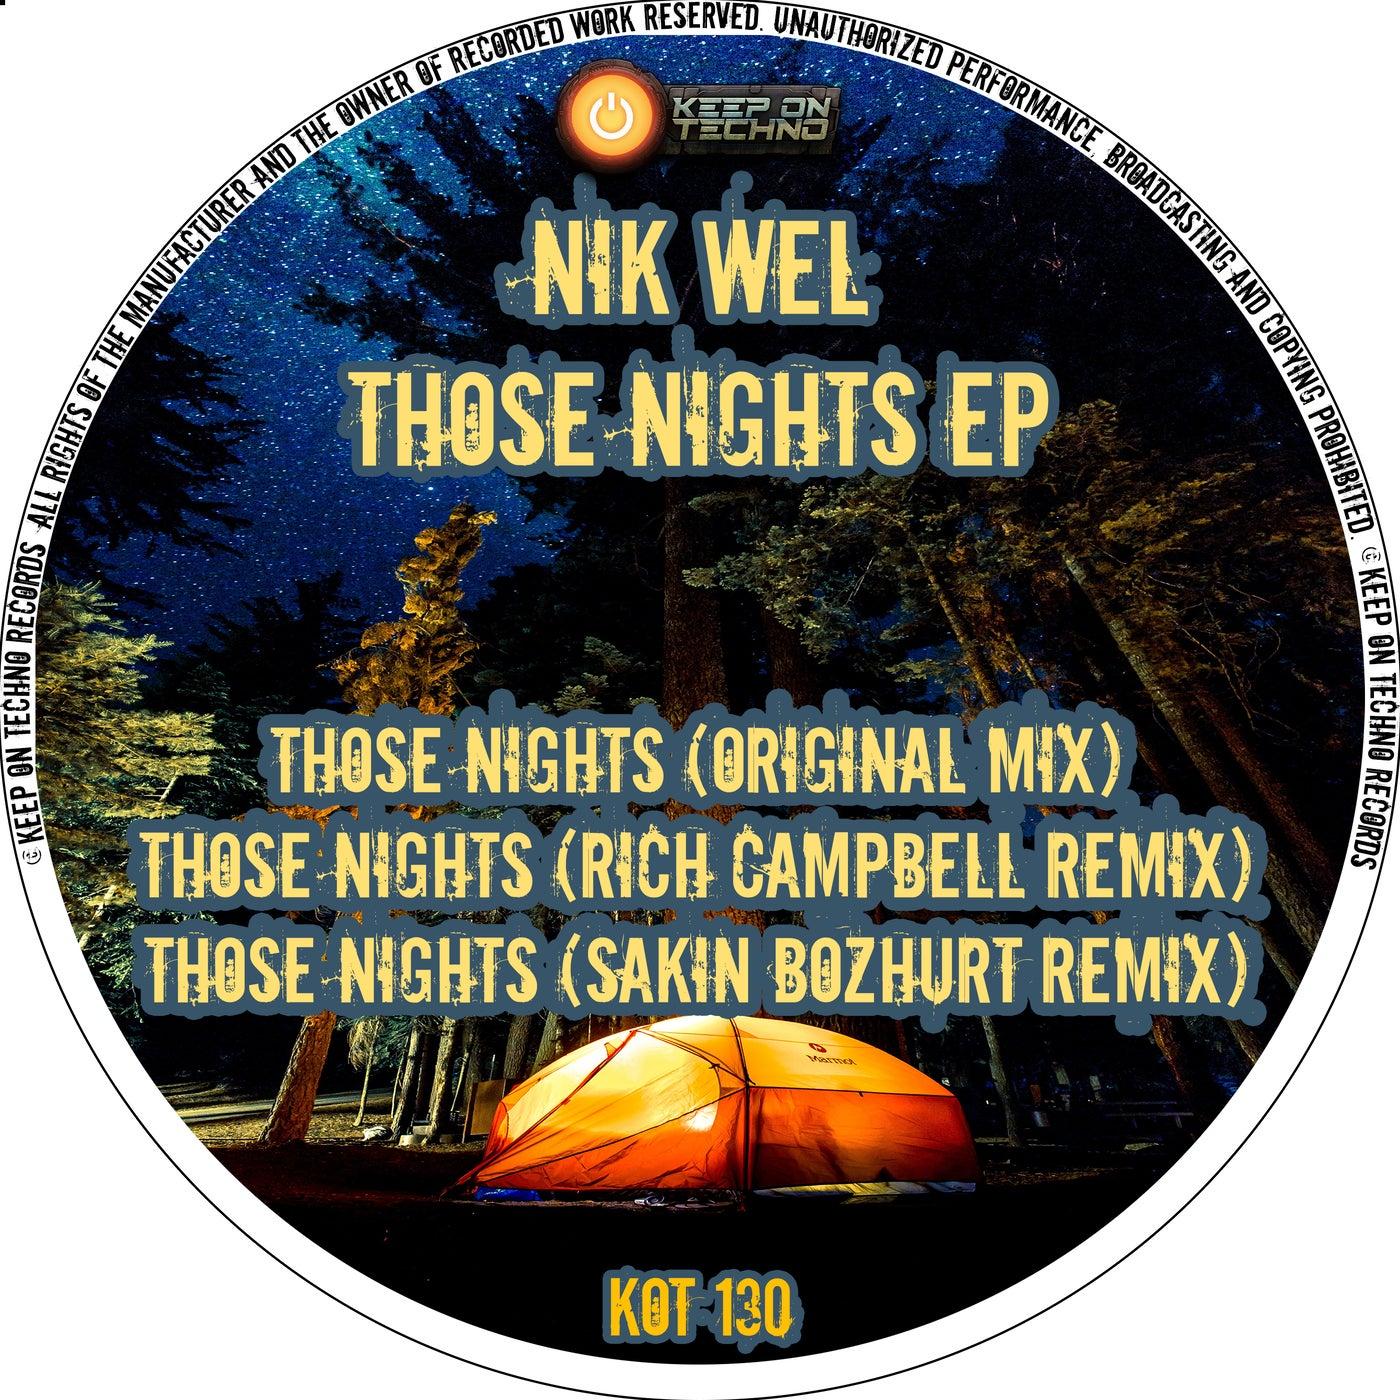 Those Nights (Original Mix)